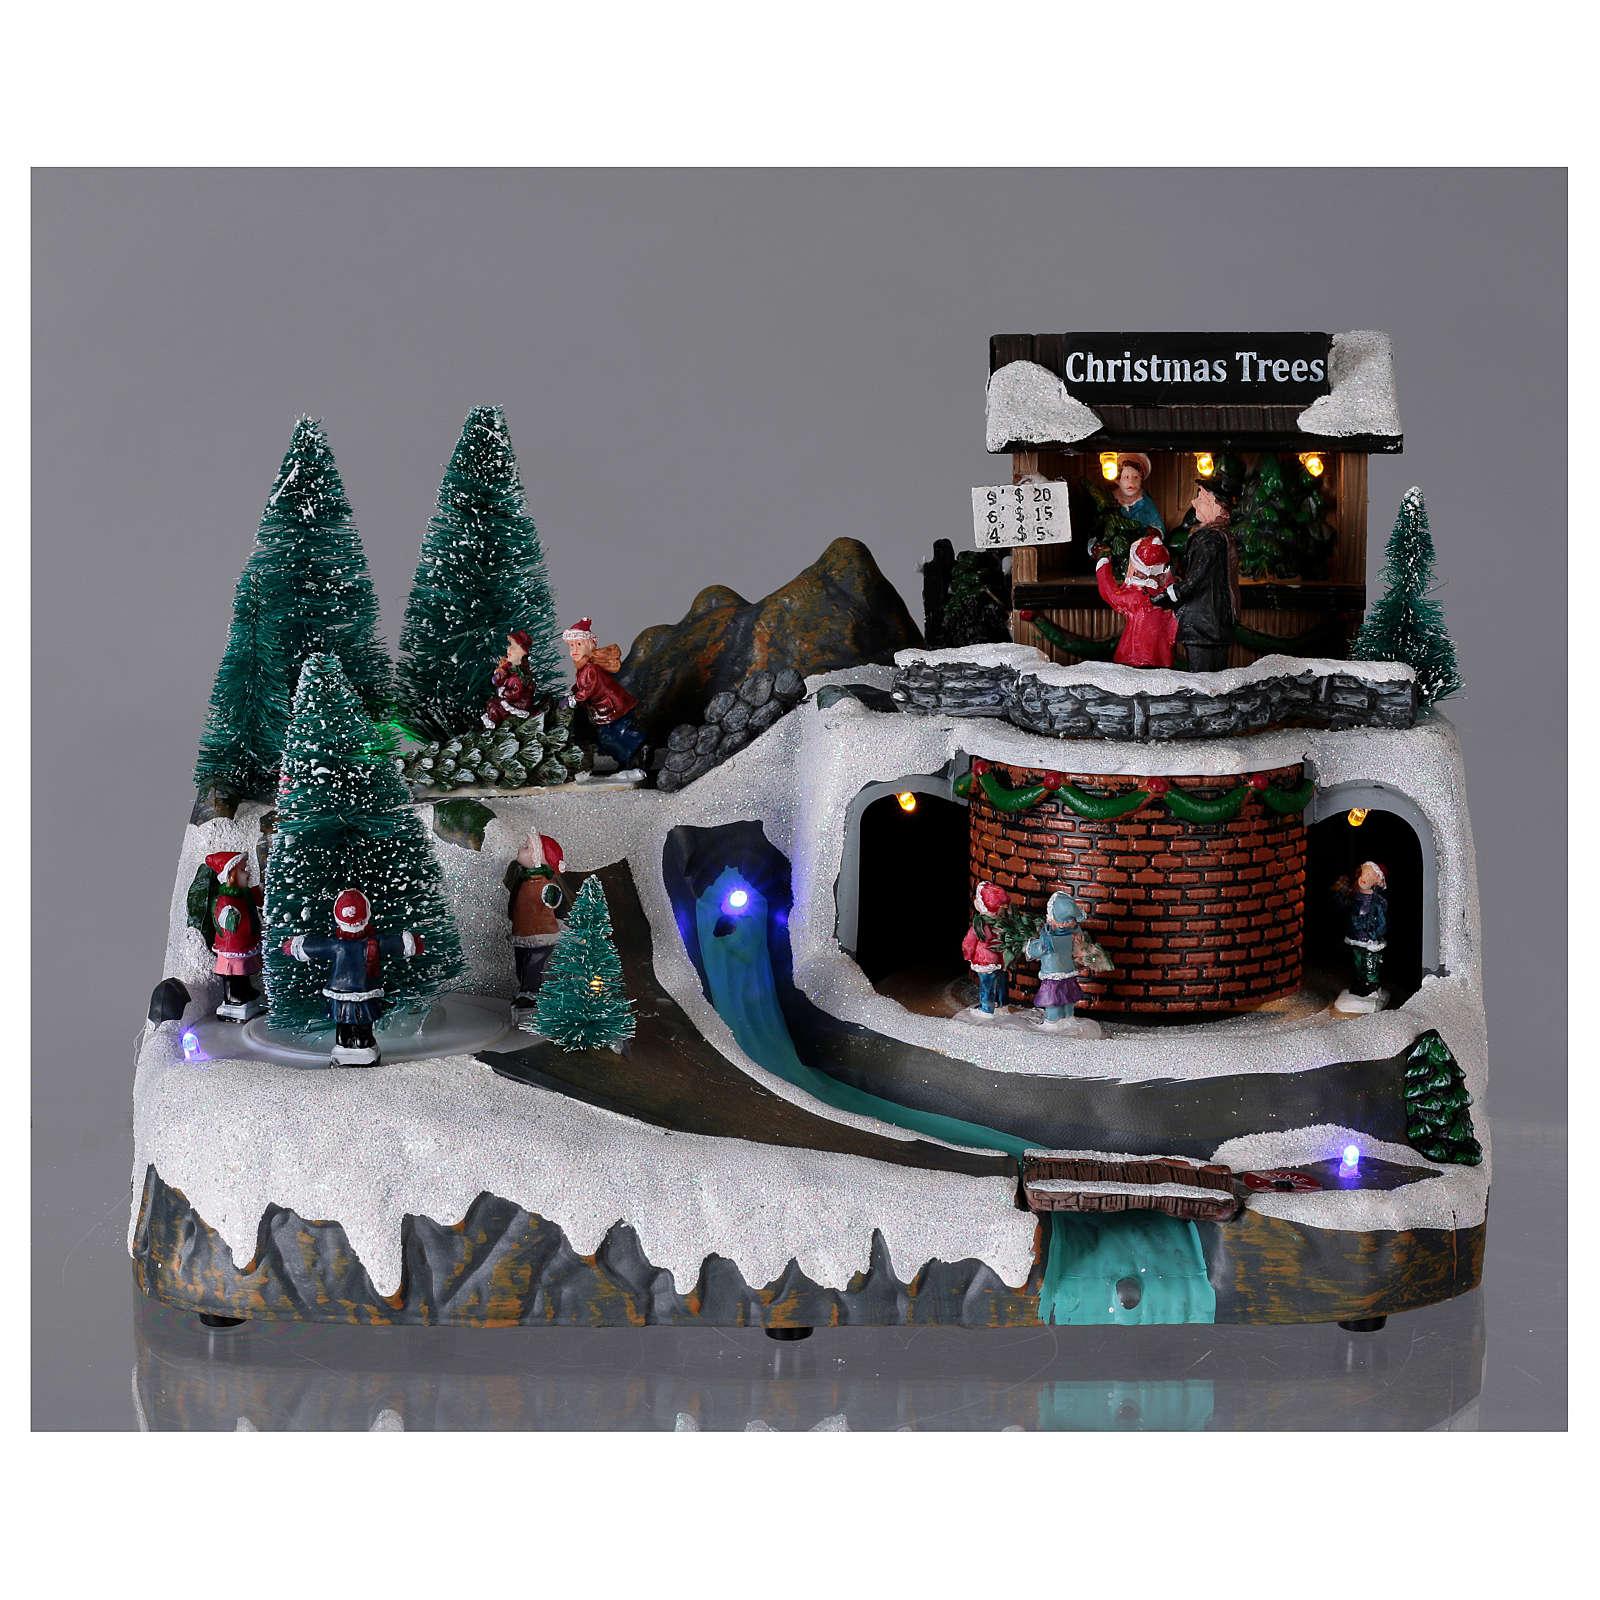 Paisaje navideño iluminado con musica y movimiento 20x25x20 cm 3